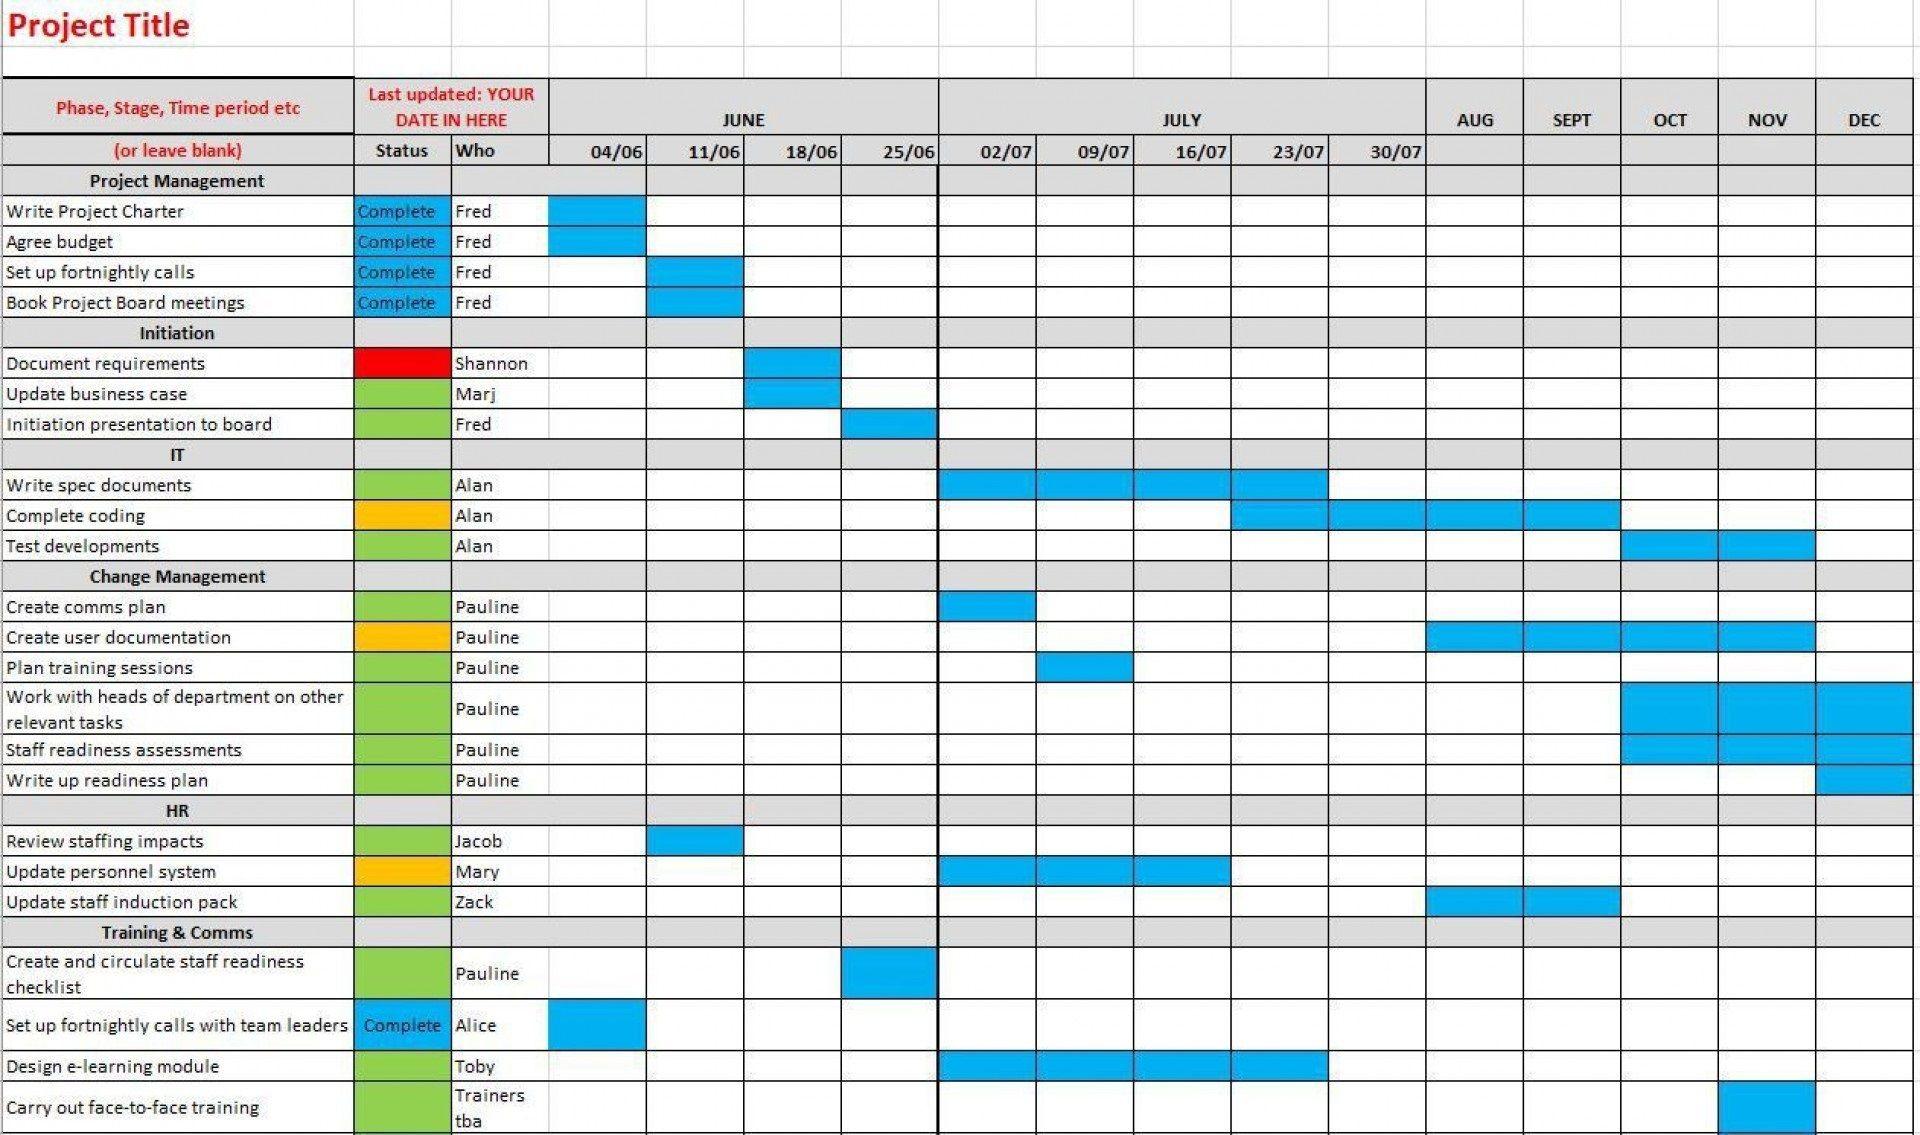 003 Breathtaking Project Management Timeline Template Excel Image  Free1920